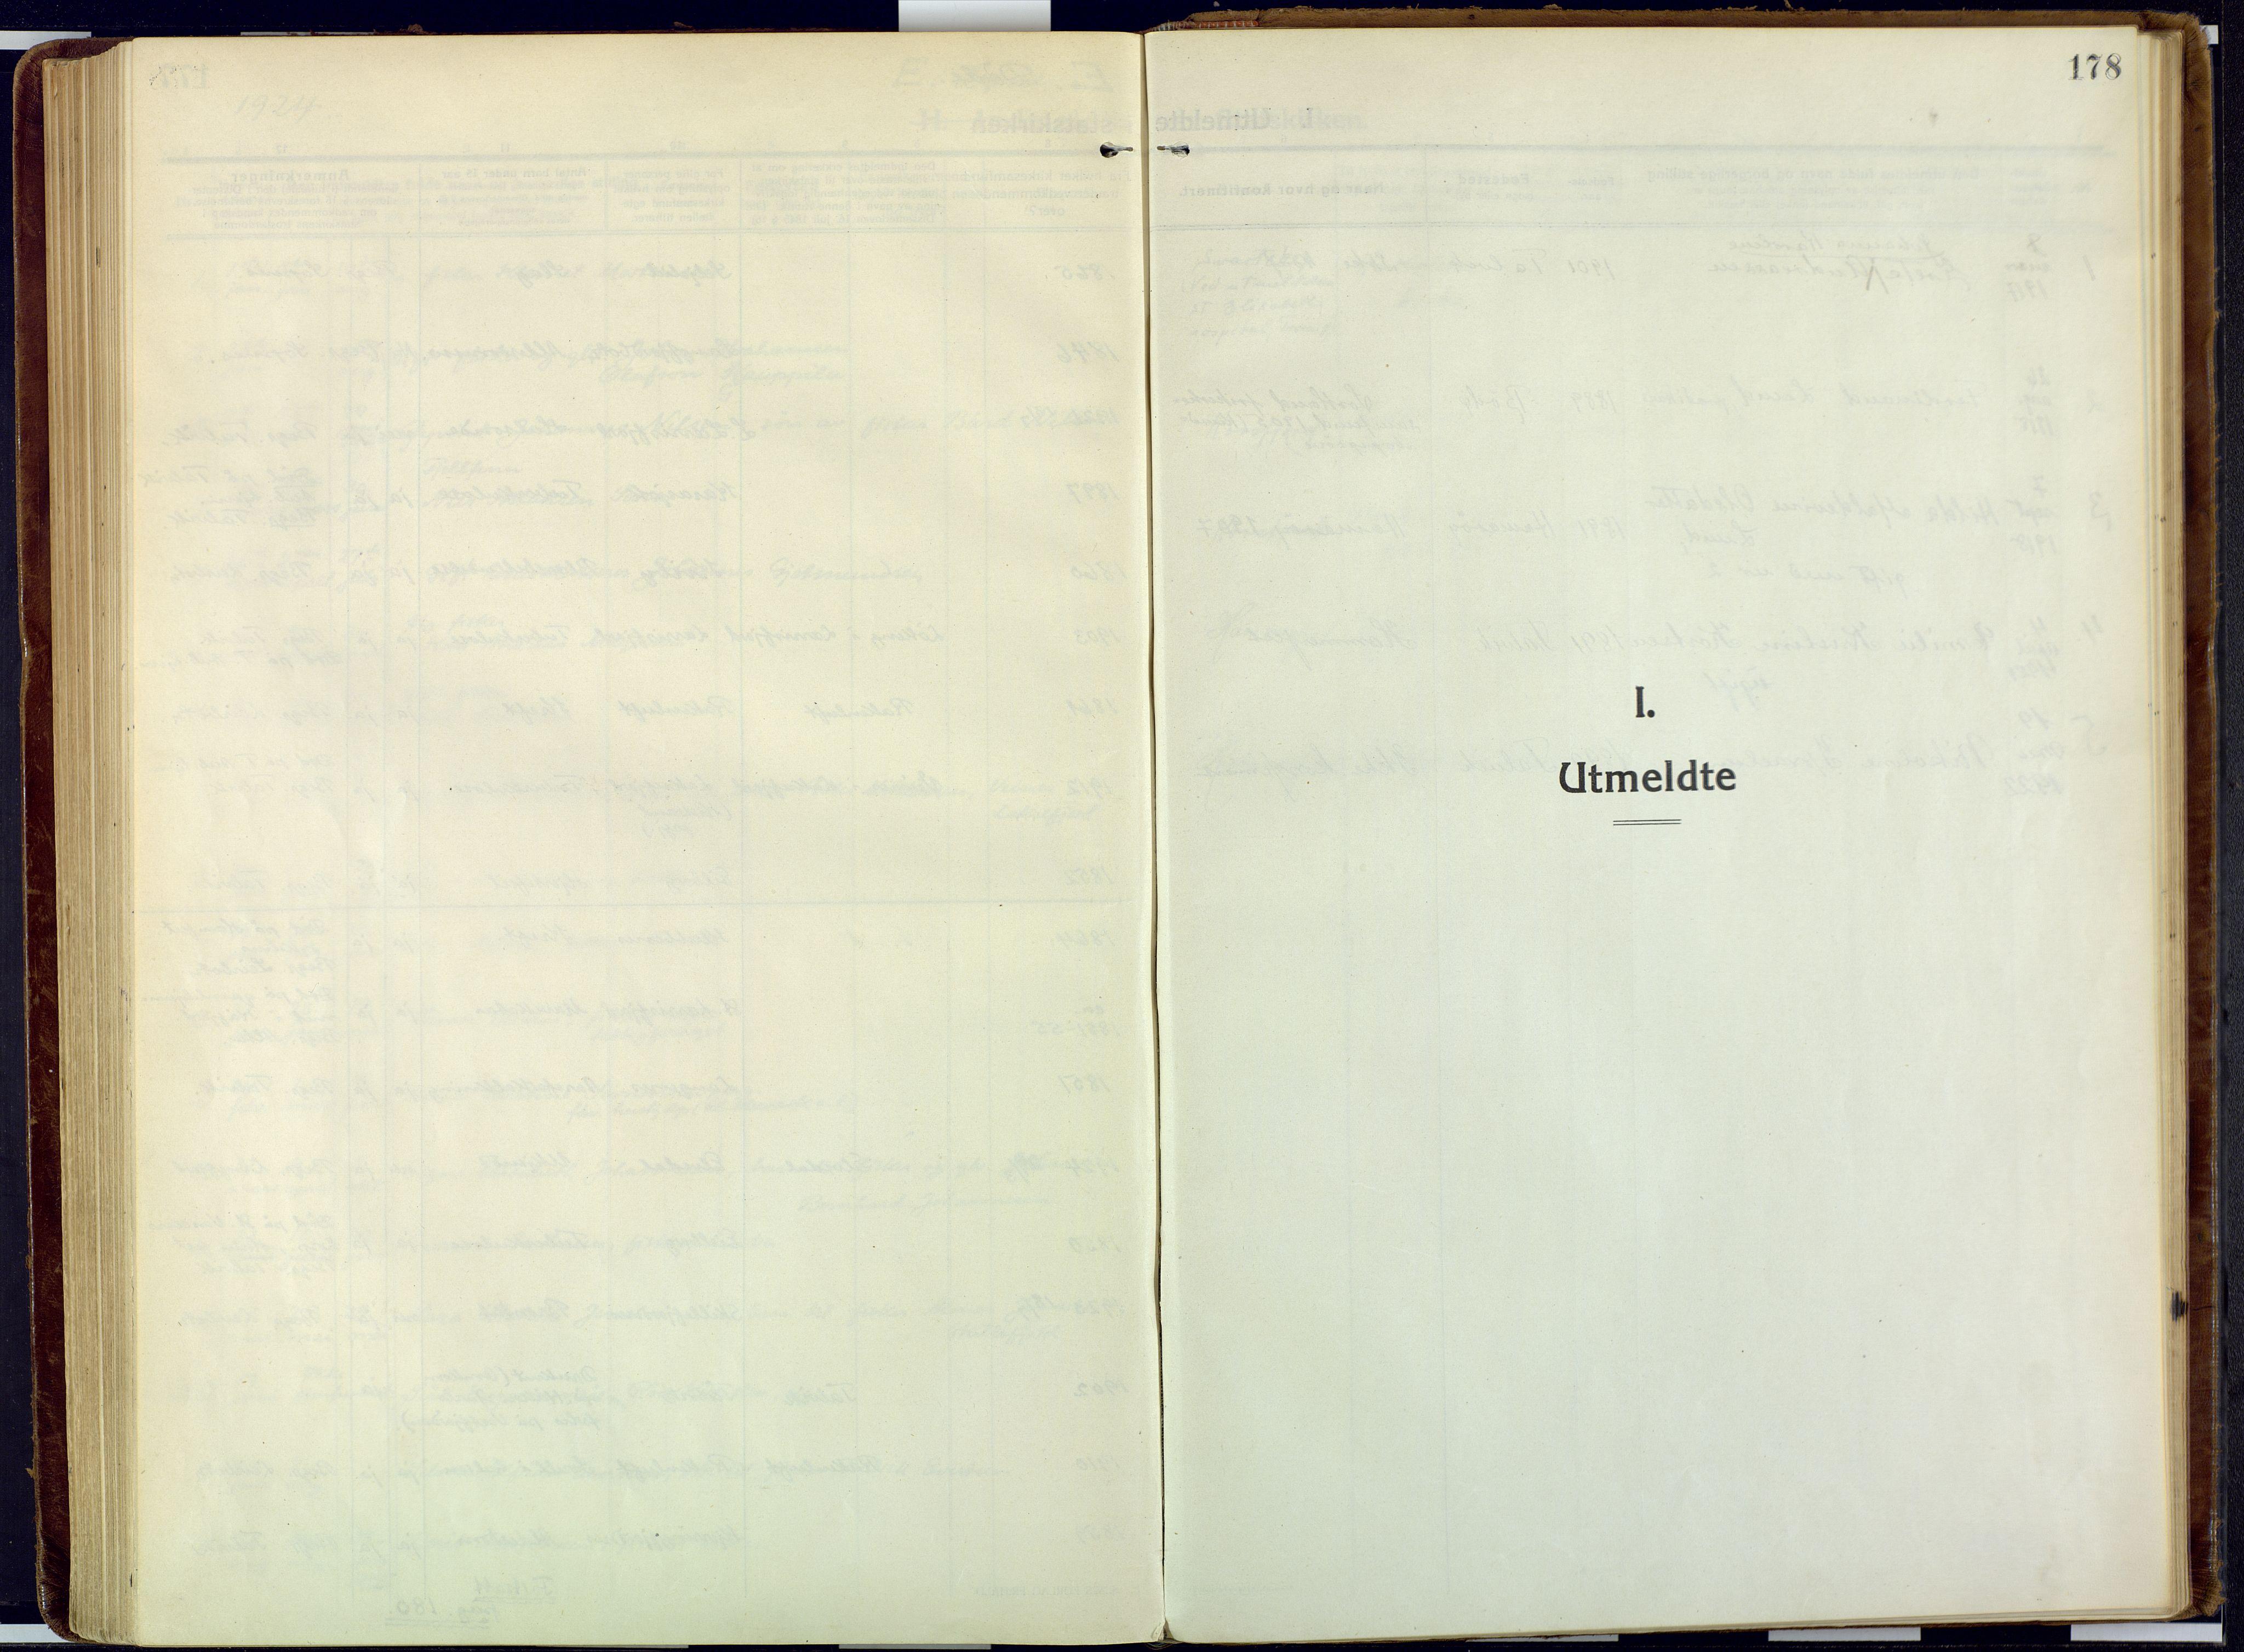 SATØ, Talvik sokneprestkontor, H/Ha/L0018kirke: Ministerialbok nr. 18, 1915-1924, s. 178